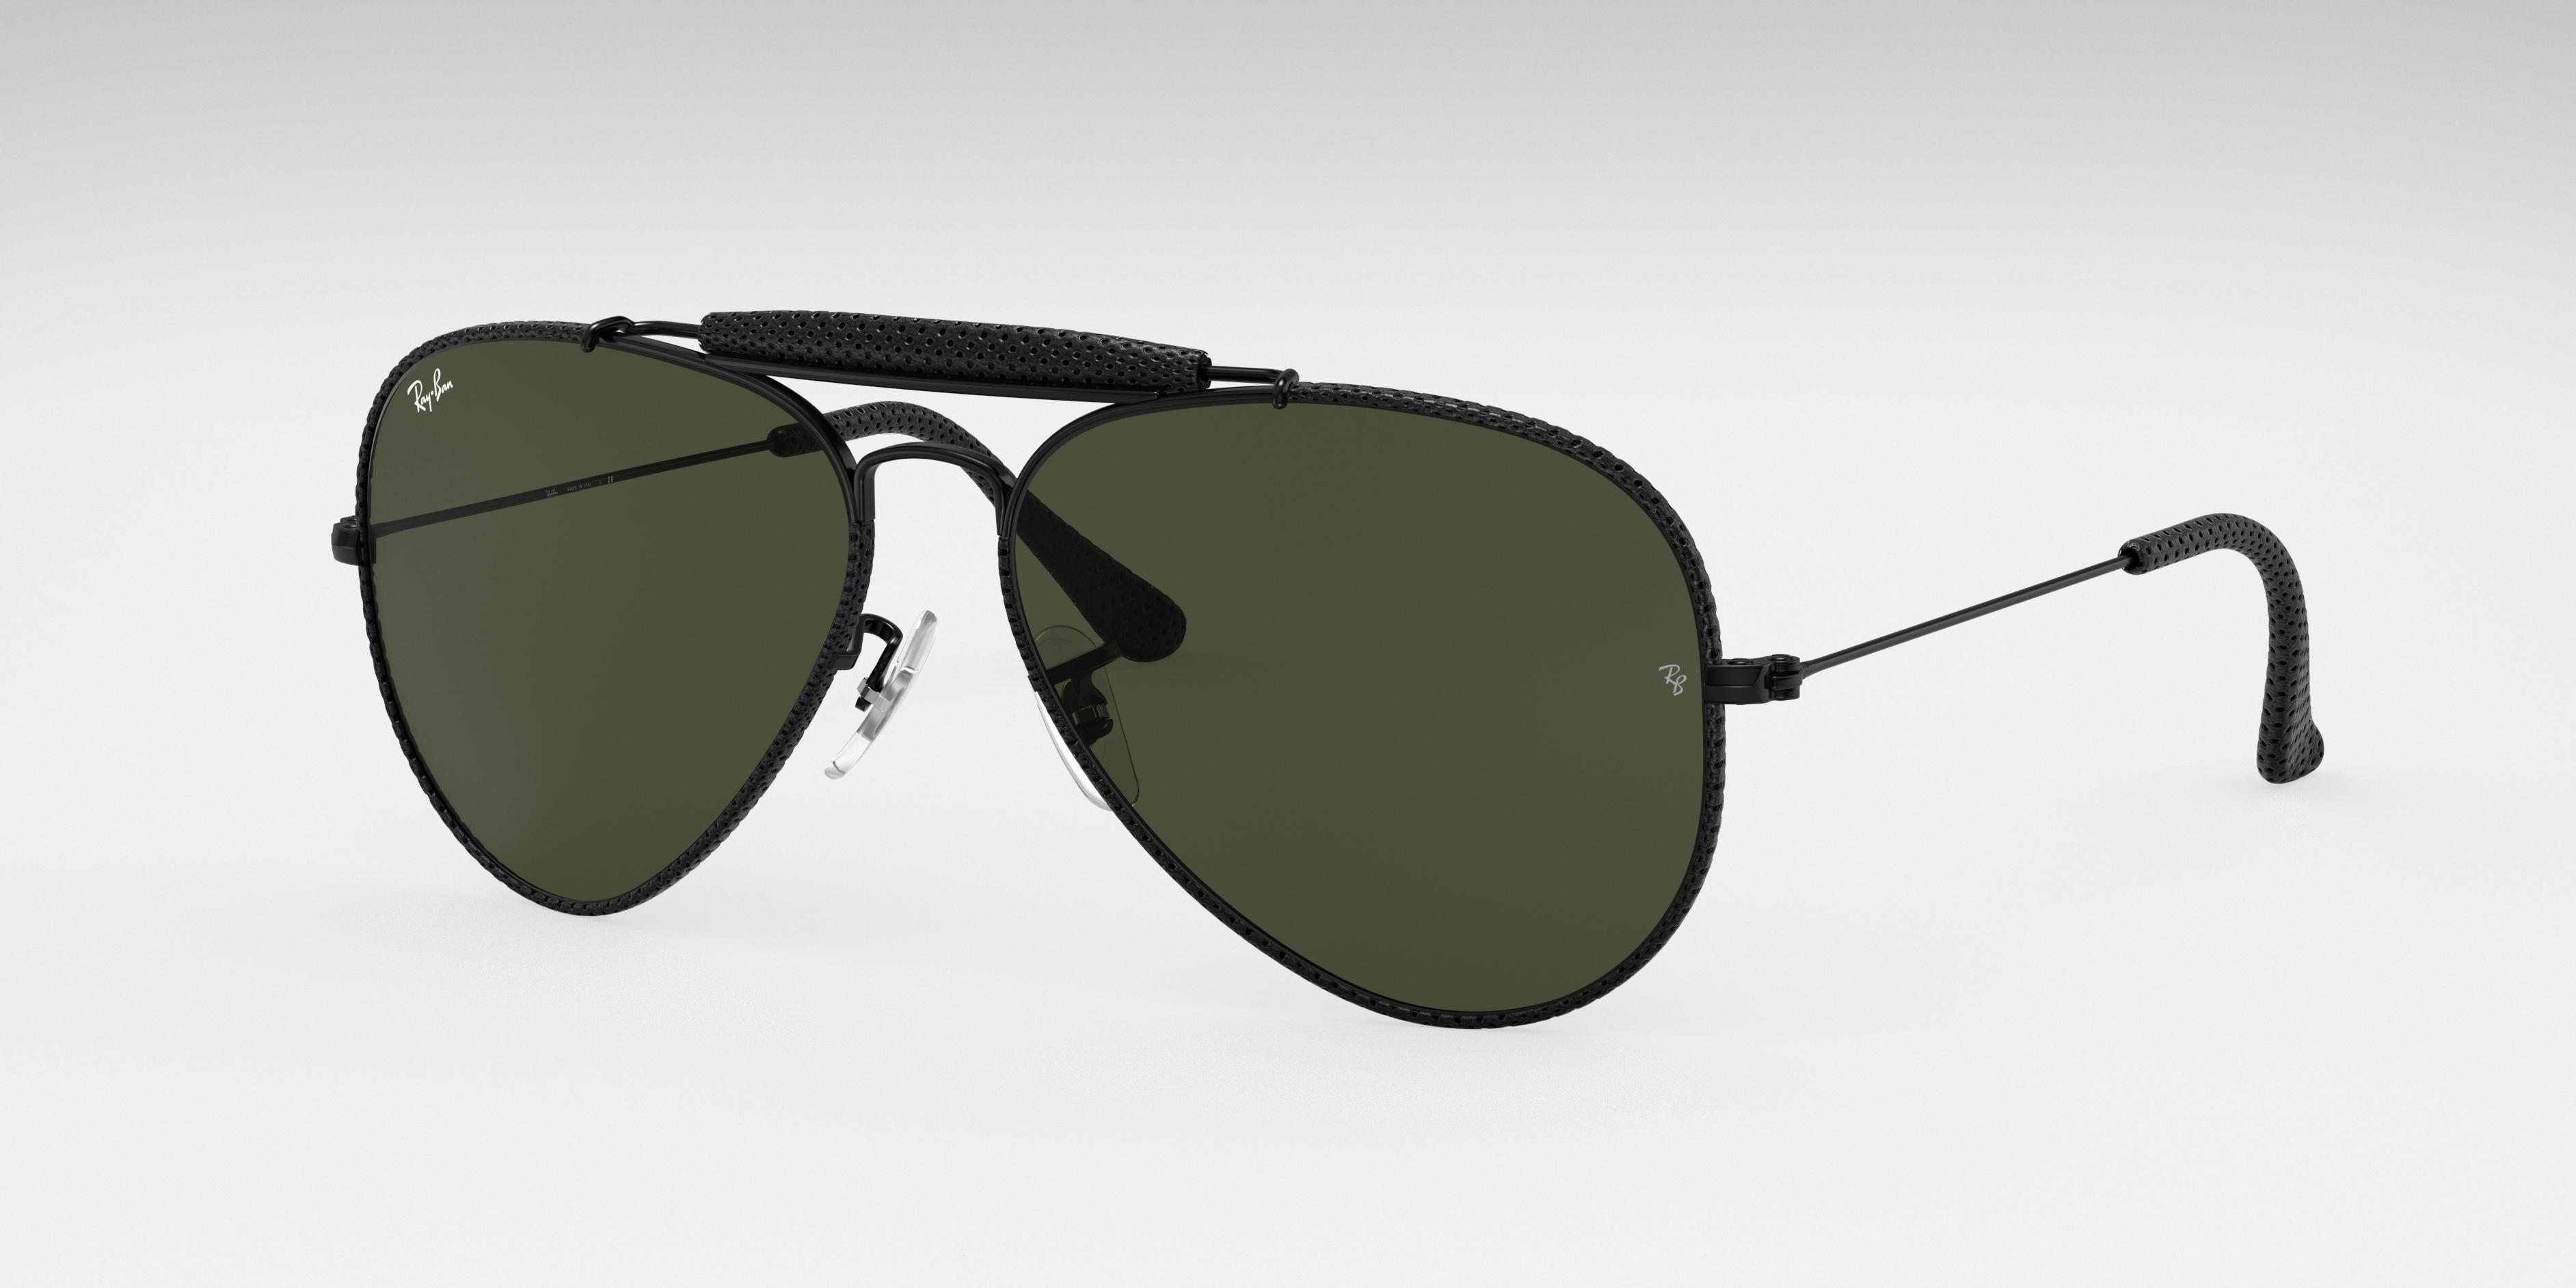 Ray-Ban Outdoorsman Craft Black, Green Lenses - RB3422Q